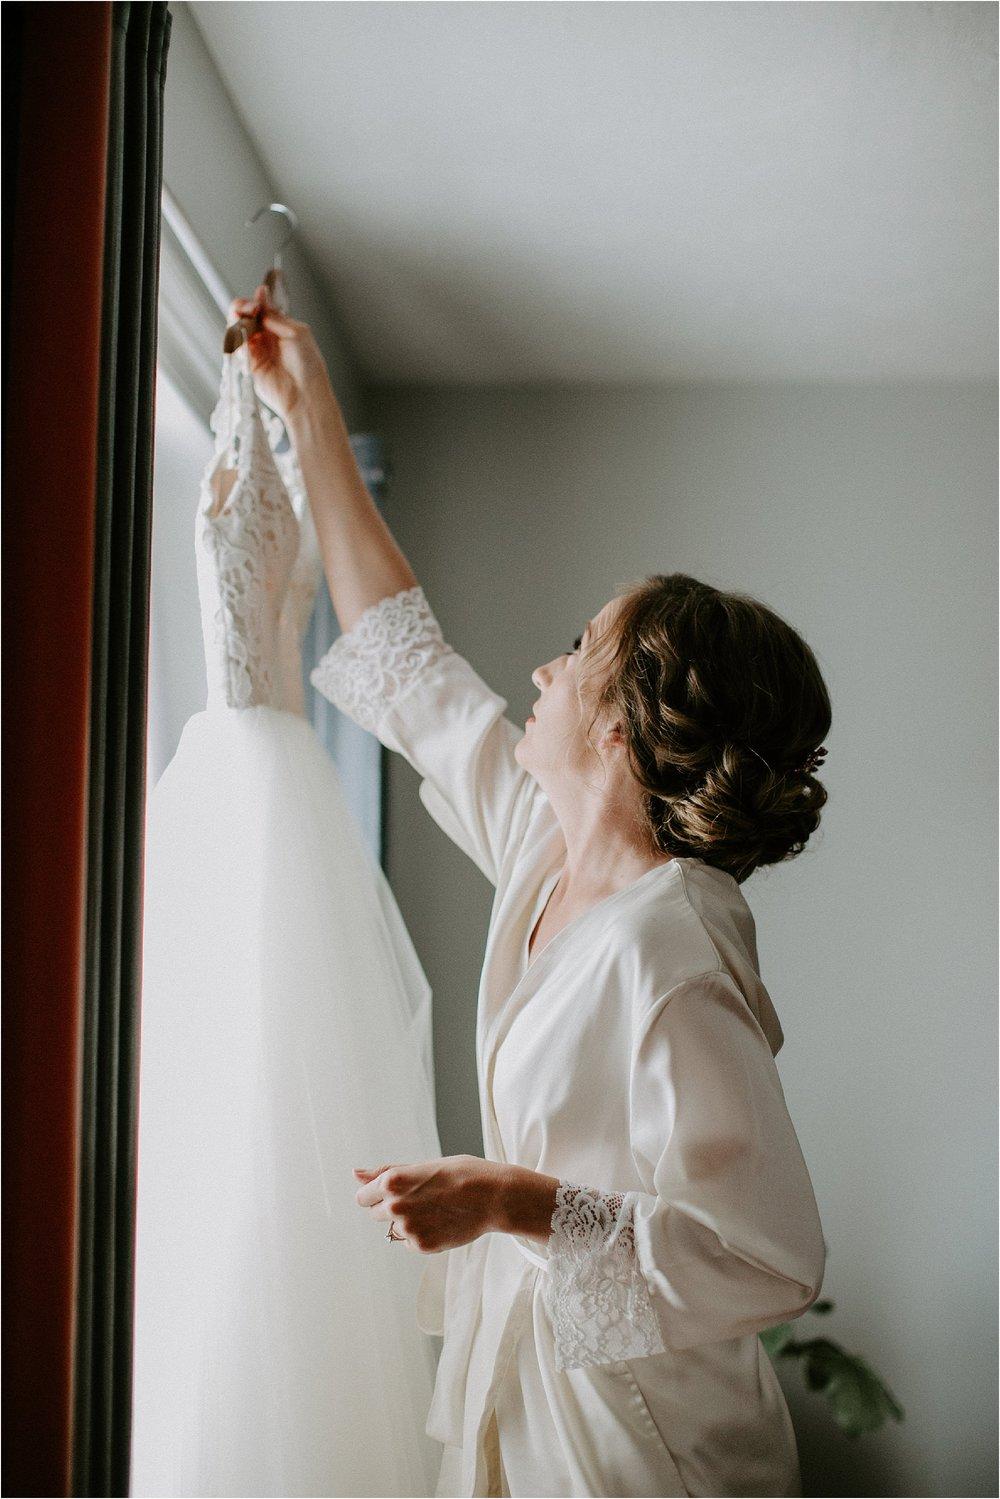 Sarah_Brookhart_Lancaster_Wedding_Photographer_0002.jpg